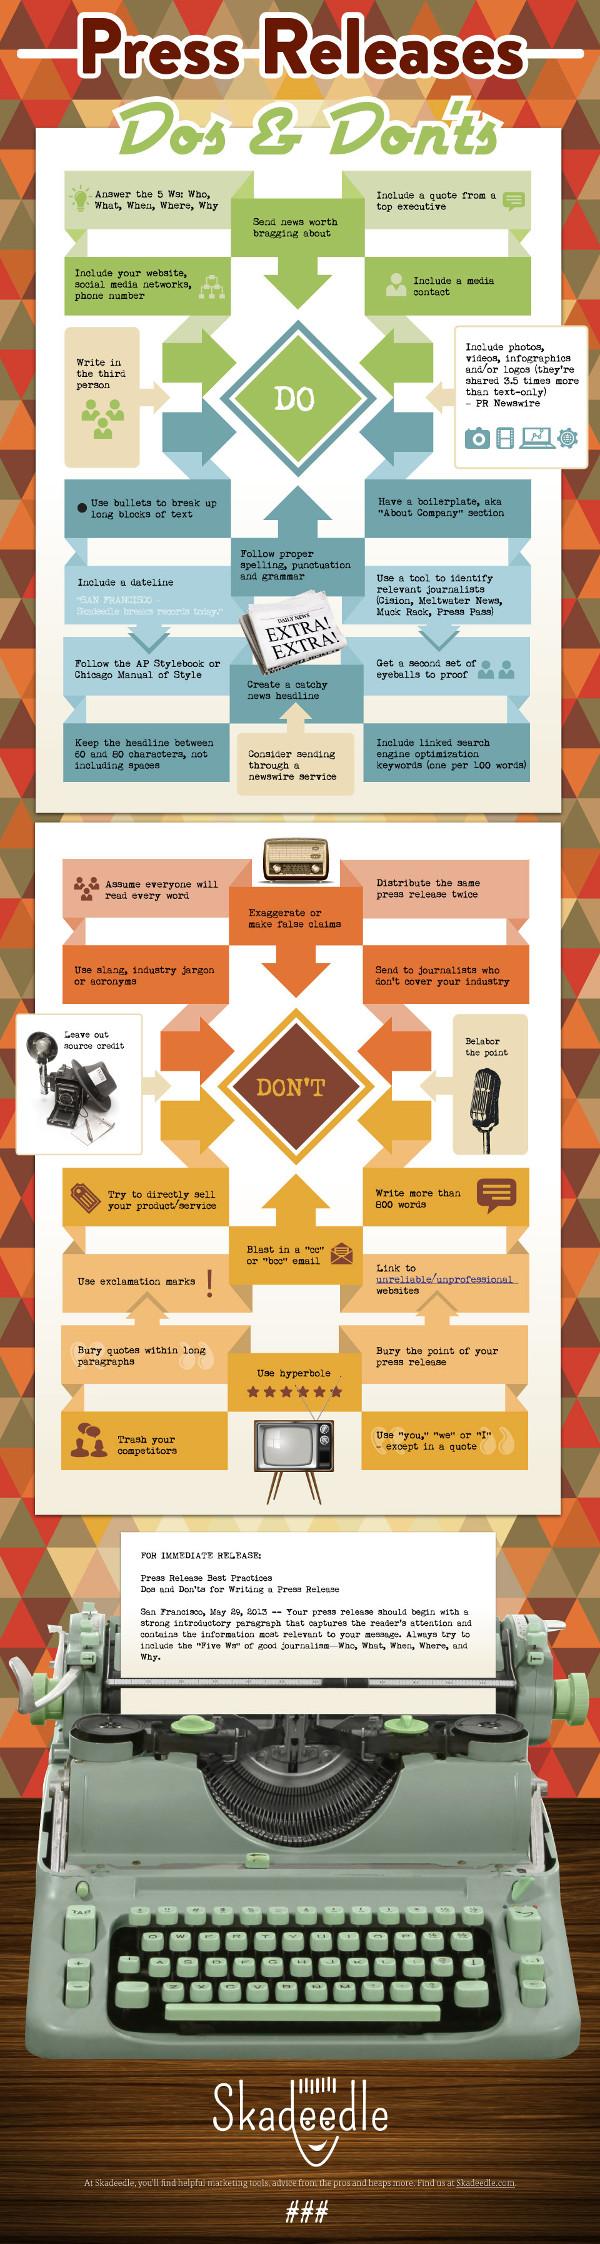 PR-dosanddonts_infographic